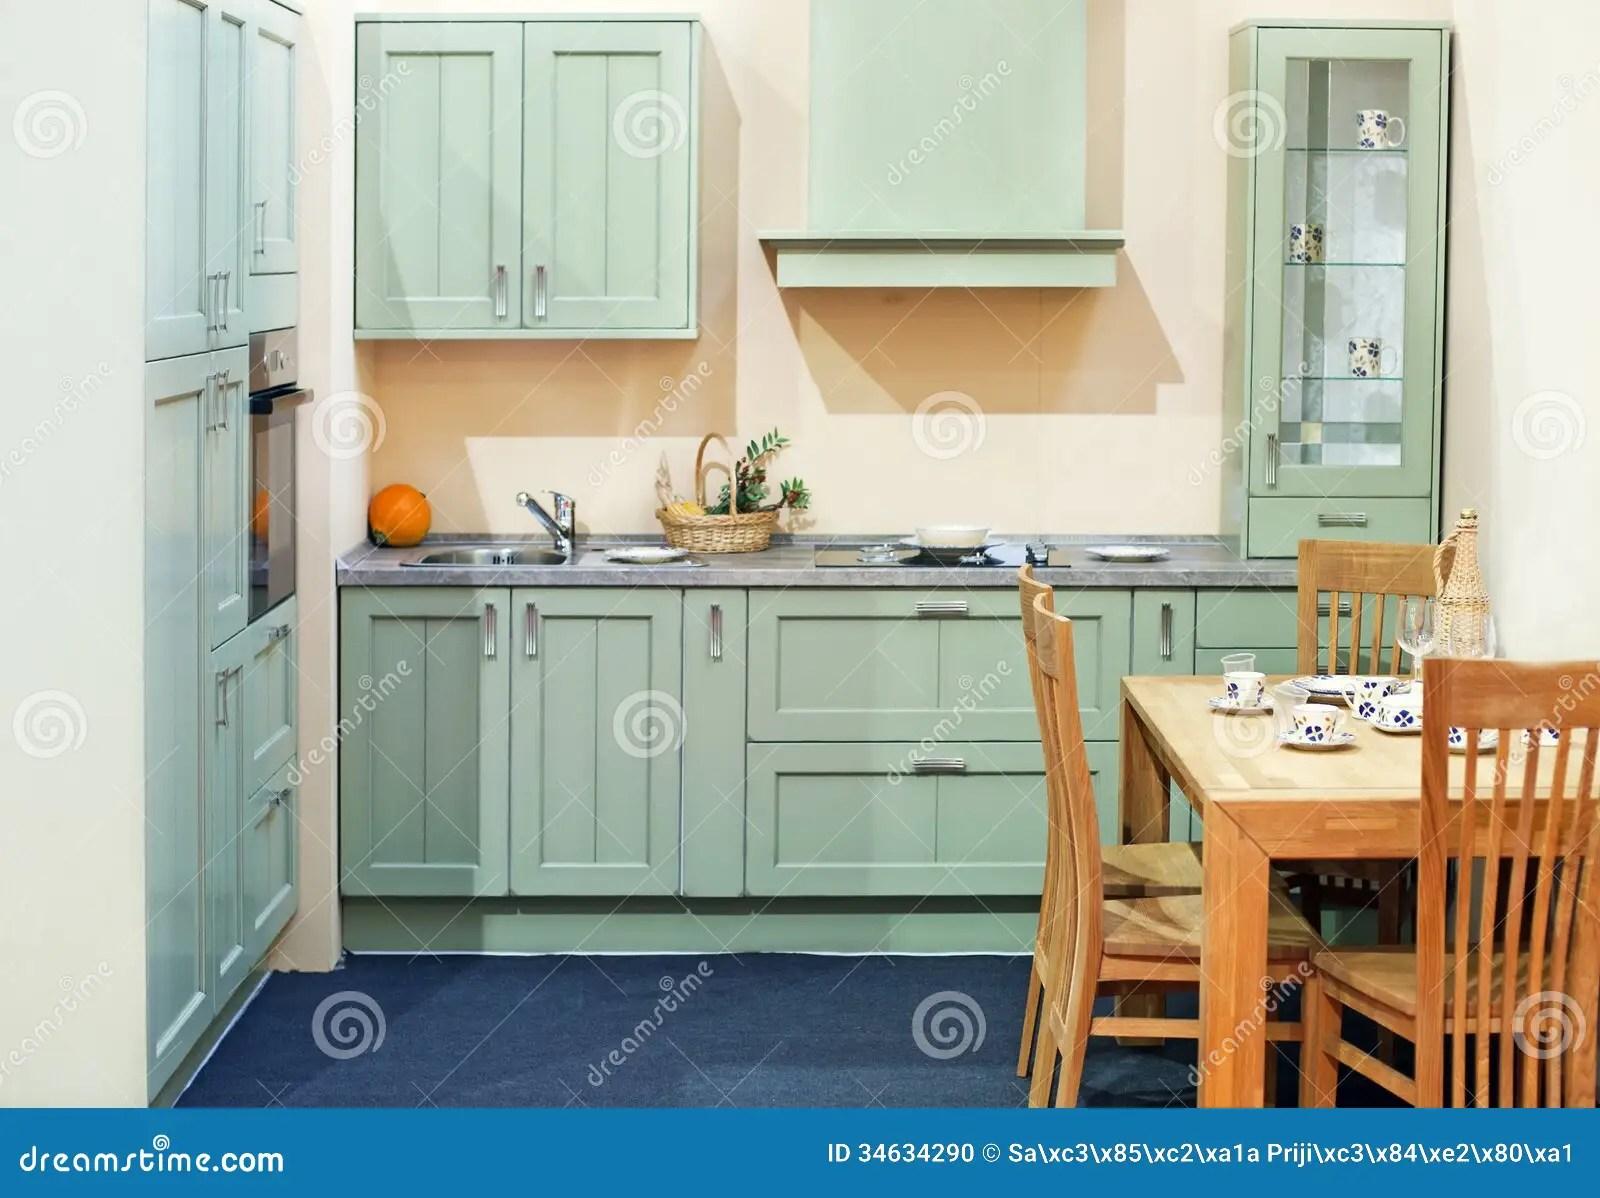 Classy Kitchen Interior Stock Photo Image 34634290